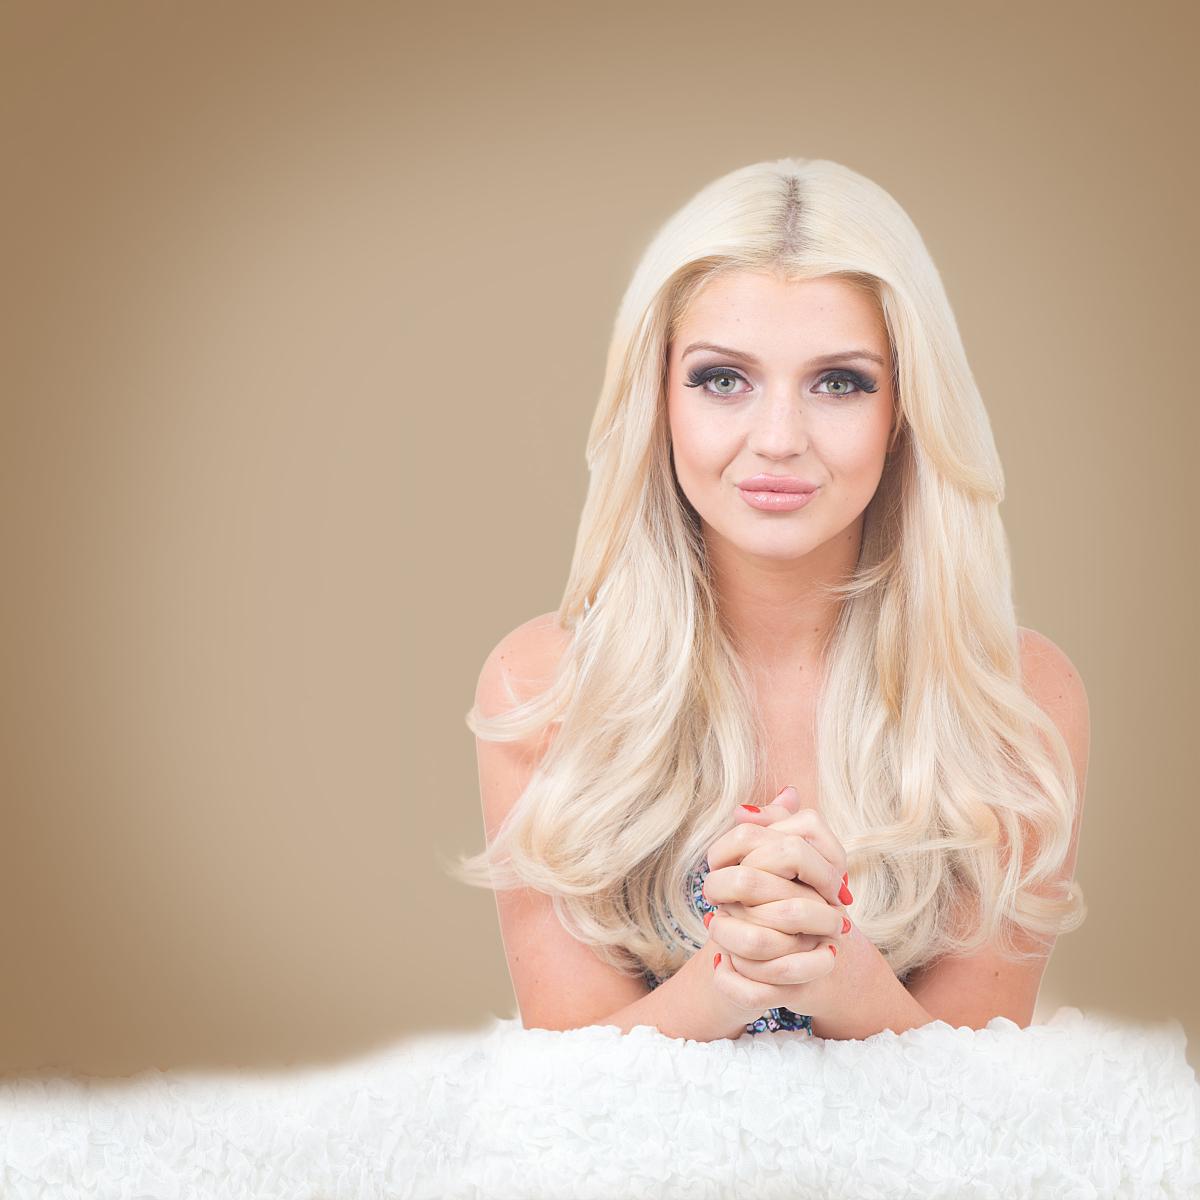 Christina-Sandra-Sergeant-Photography-Head-shots-Basingstoke-Portrait-Photographer